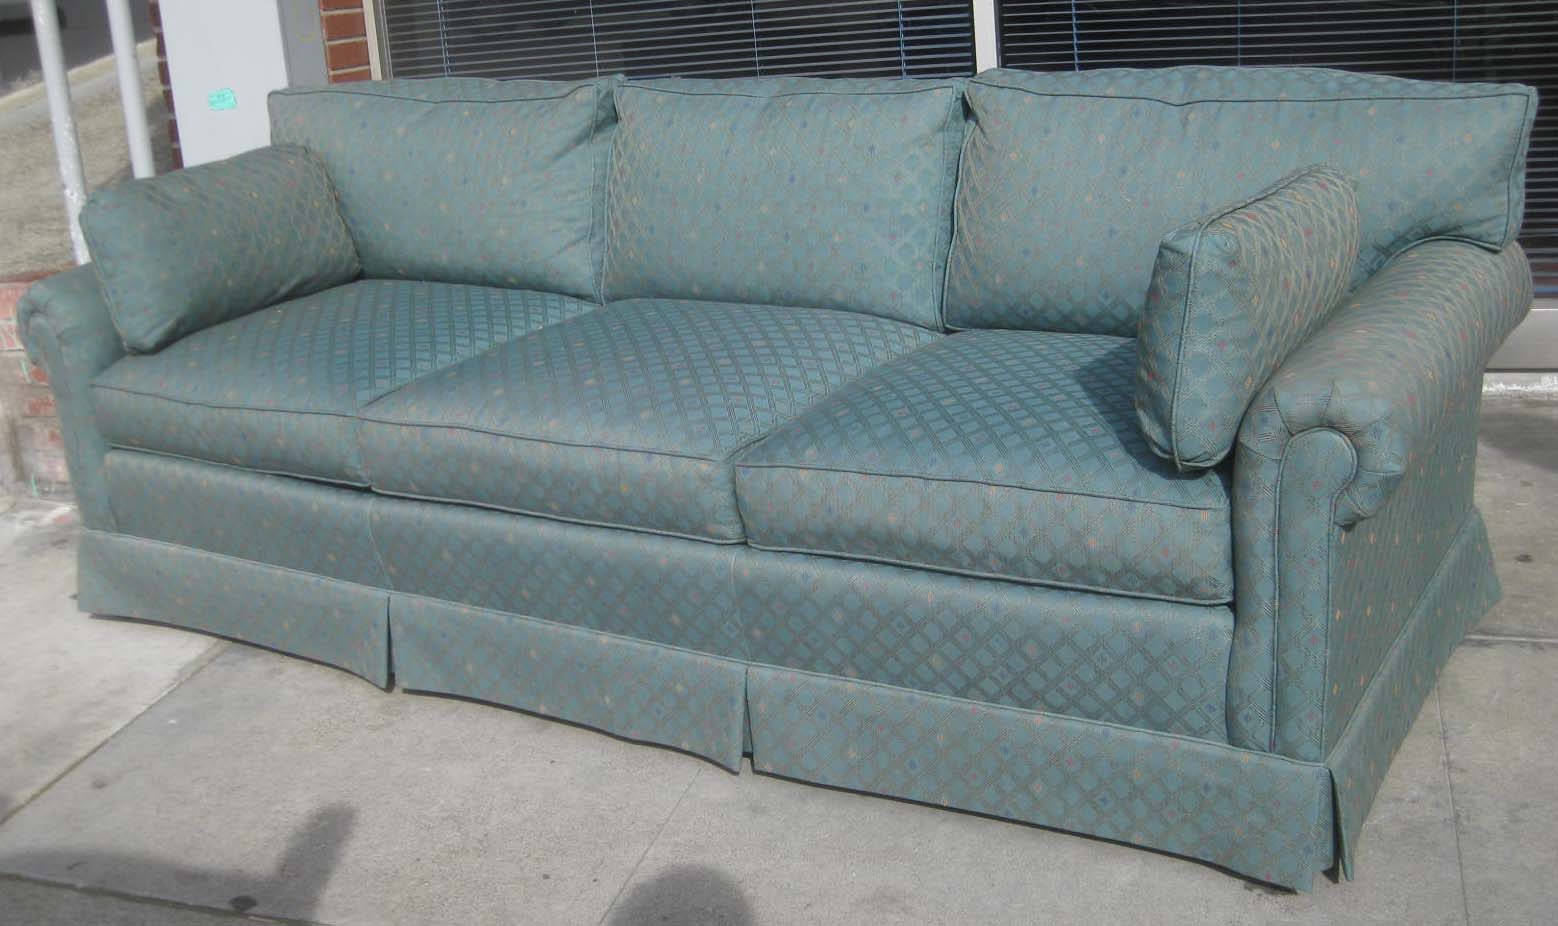 Uhuru furniture collectibles sold turquoise sofa 85 - Turquoise sofa ...